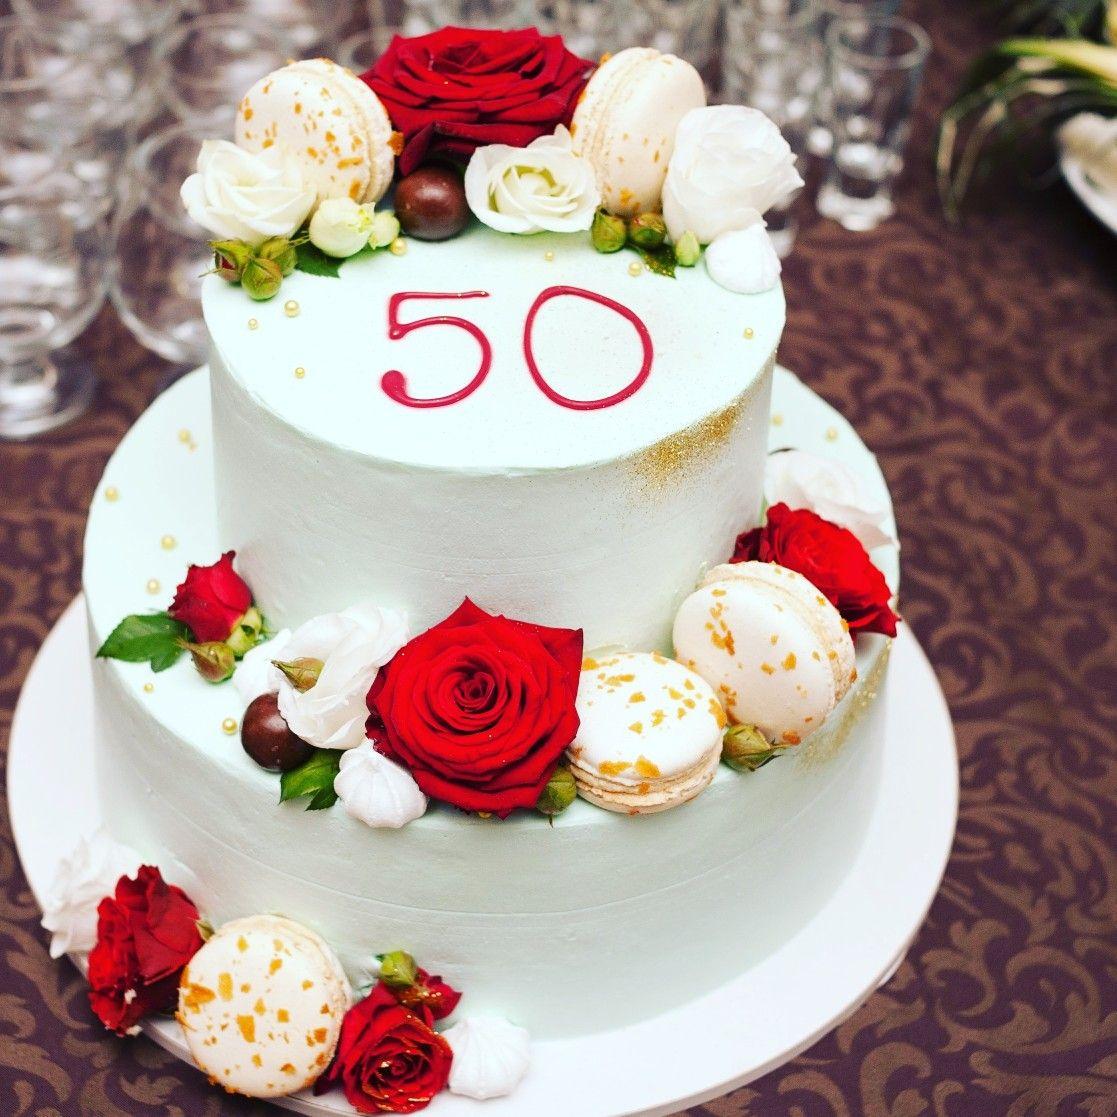 2 Tier cake in 2020 Wedding cake prices, Birthday cake